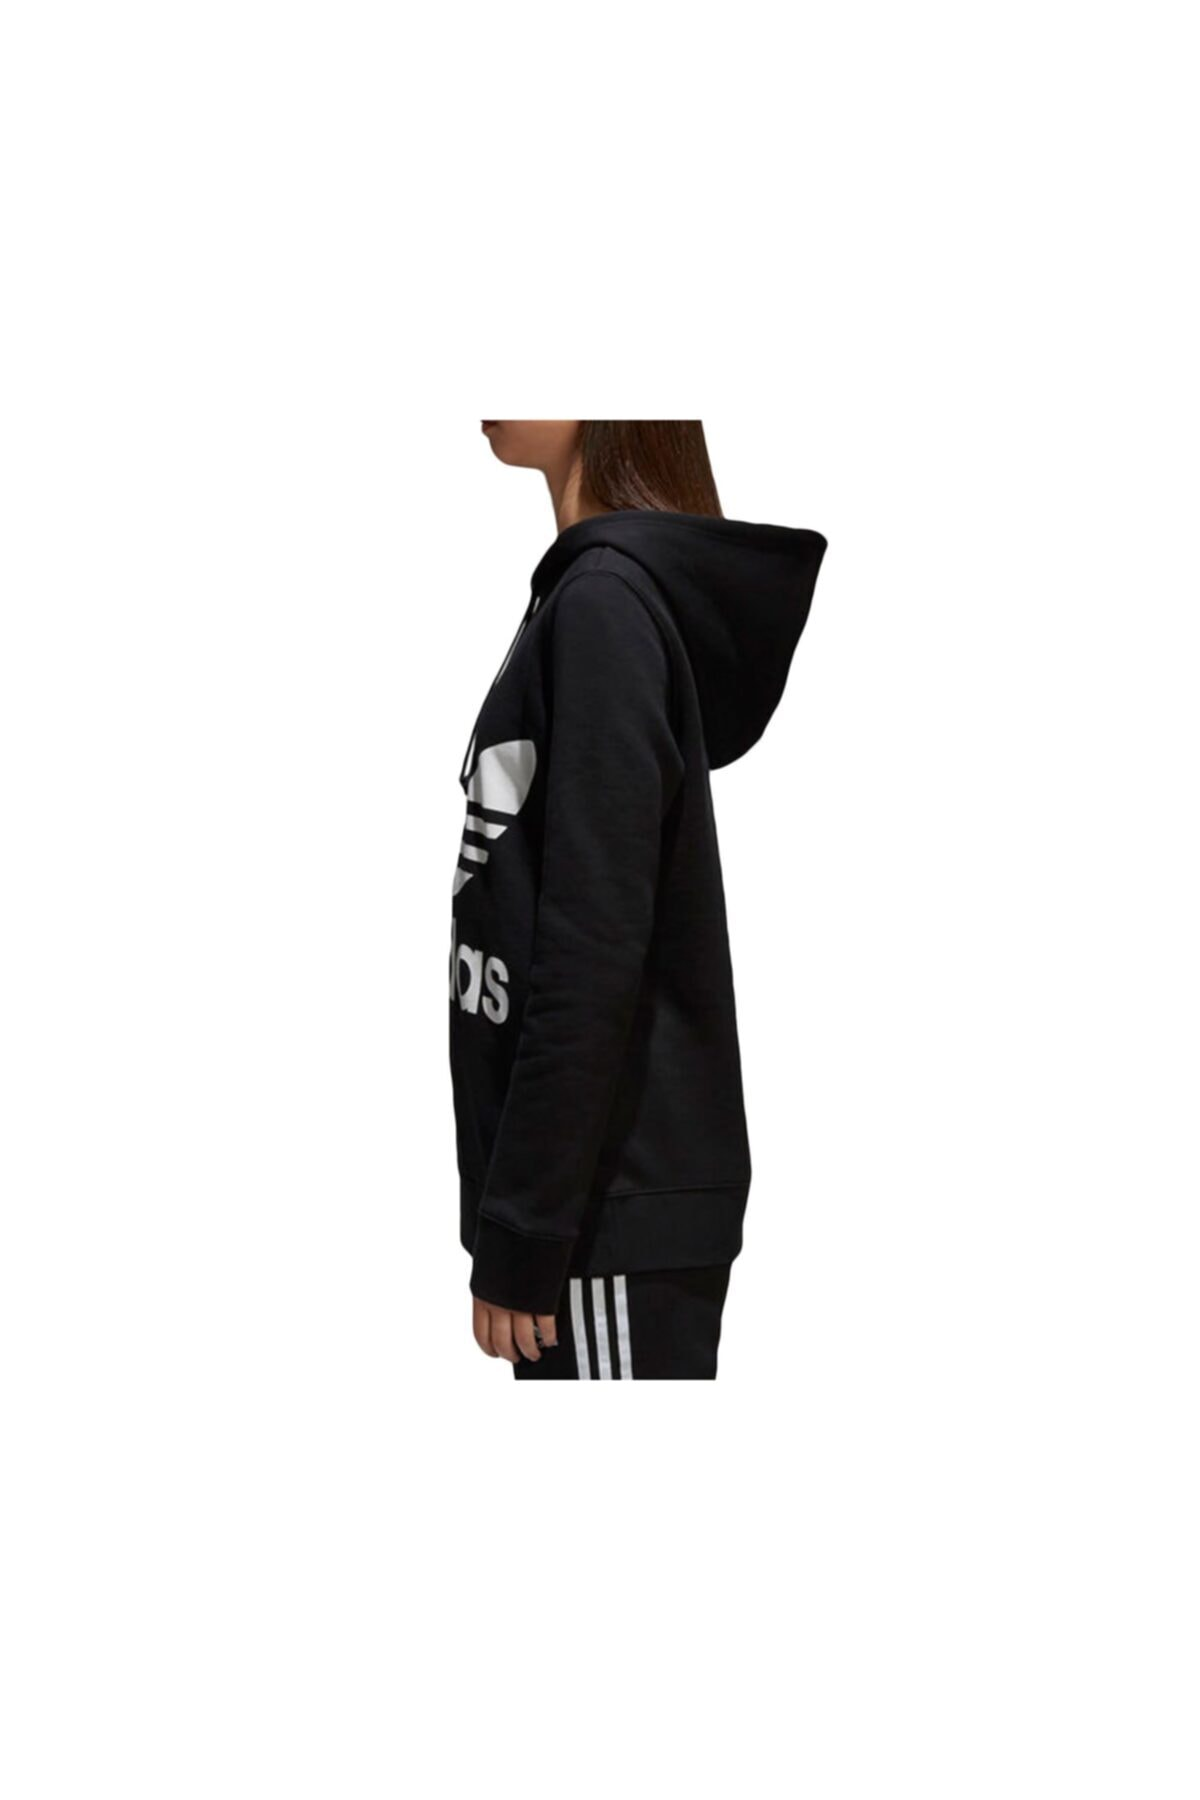 adidas Kadın Siyah Ce2408 Trefoıl Hoodıe Sweatshirt 2